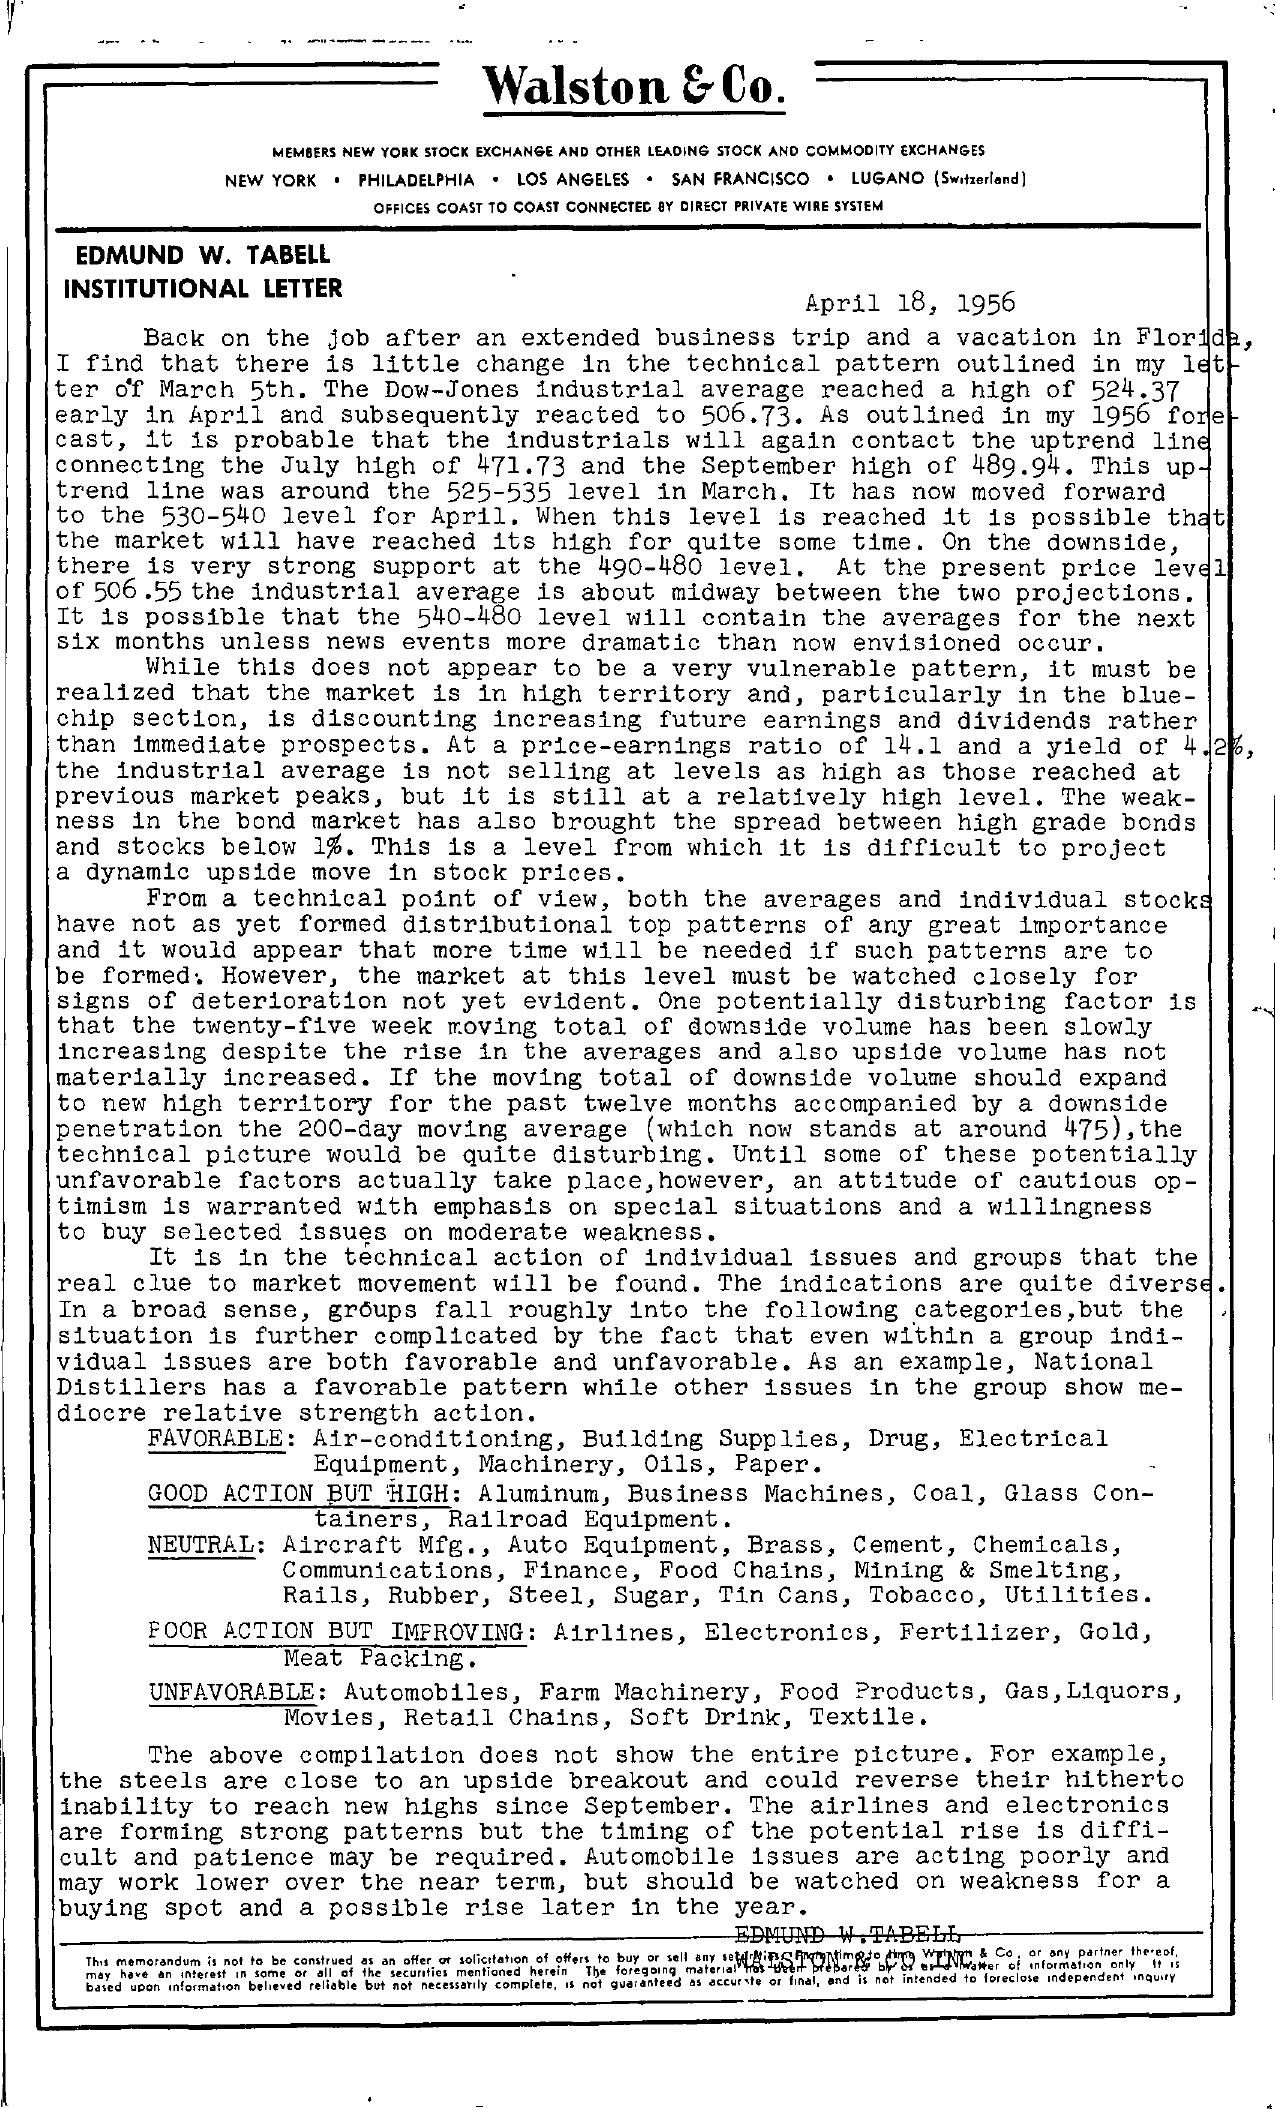 Tabell's Market Letter - April 18, 1956